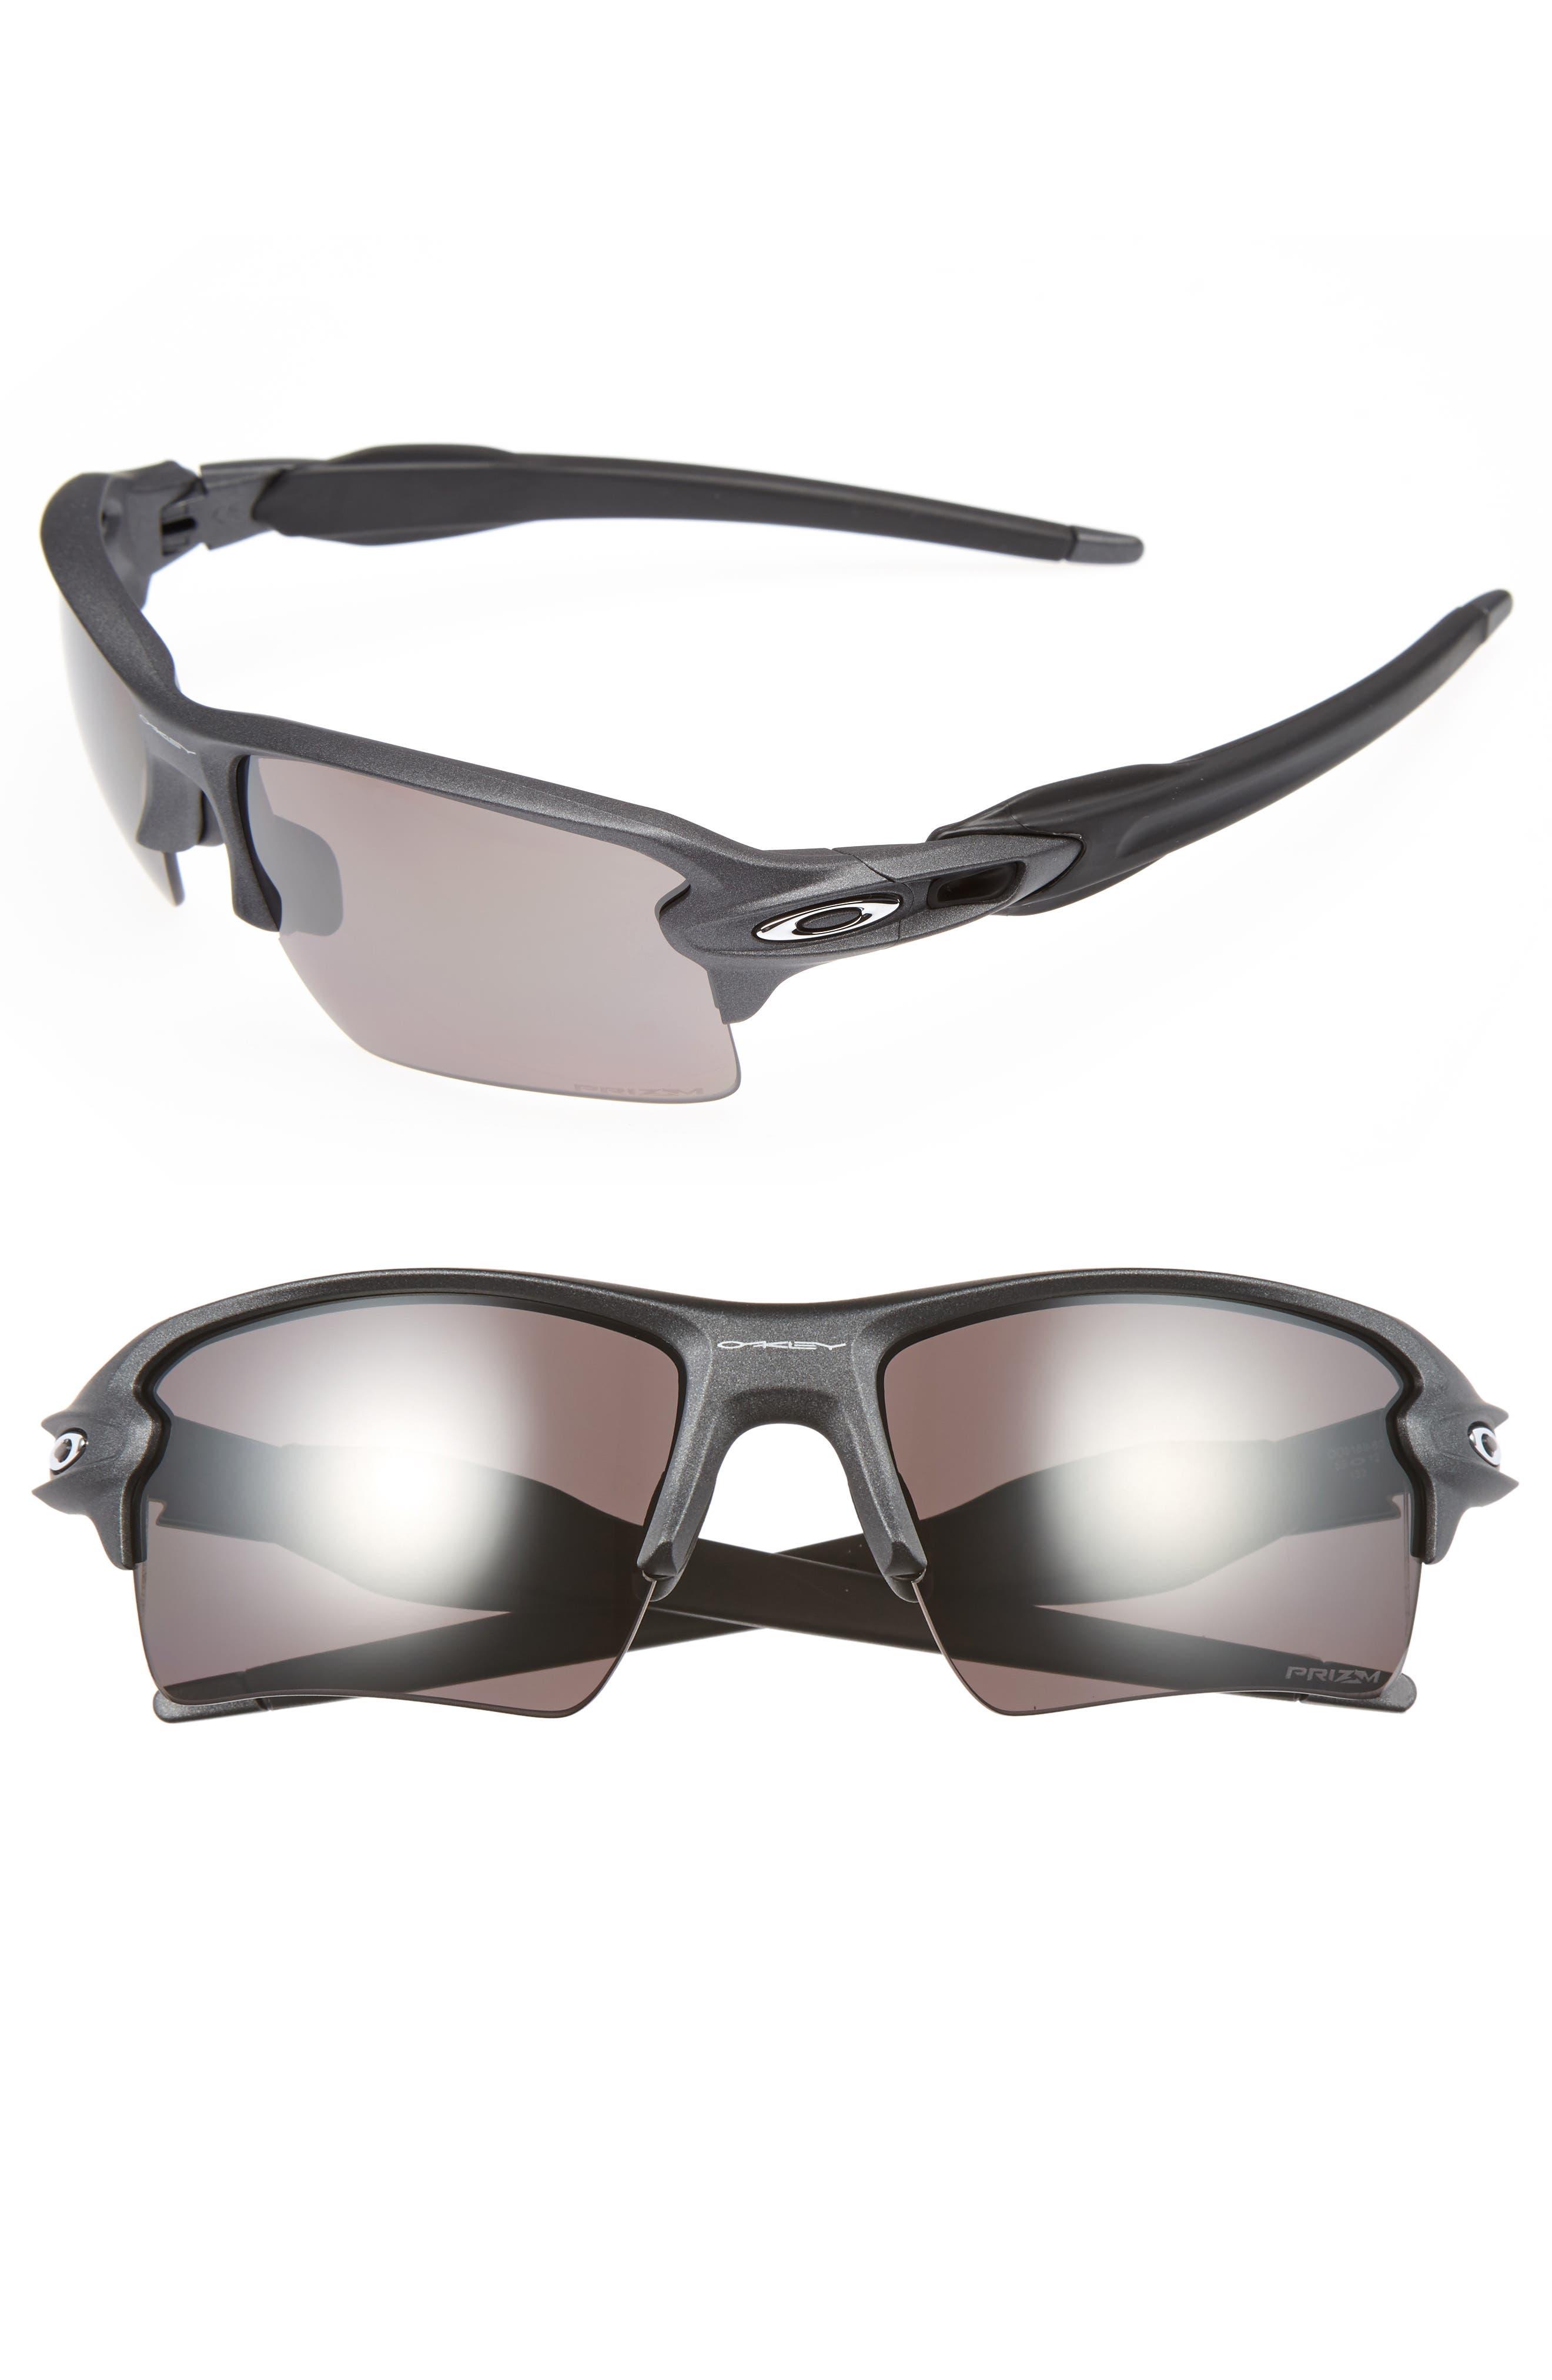 Flak 2.0 XL 59mm Polarized Sunglasses,                             Alternate thumbnail 2, color,                             020